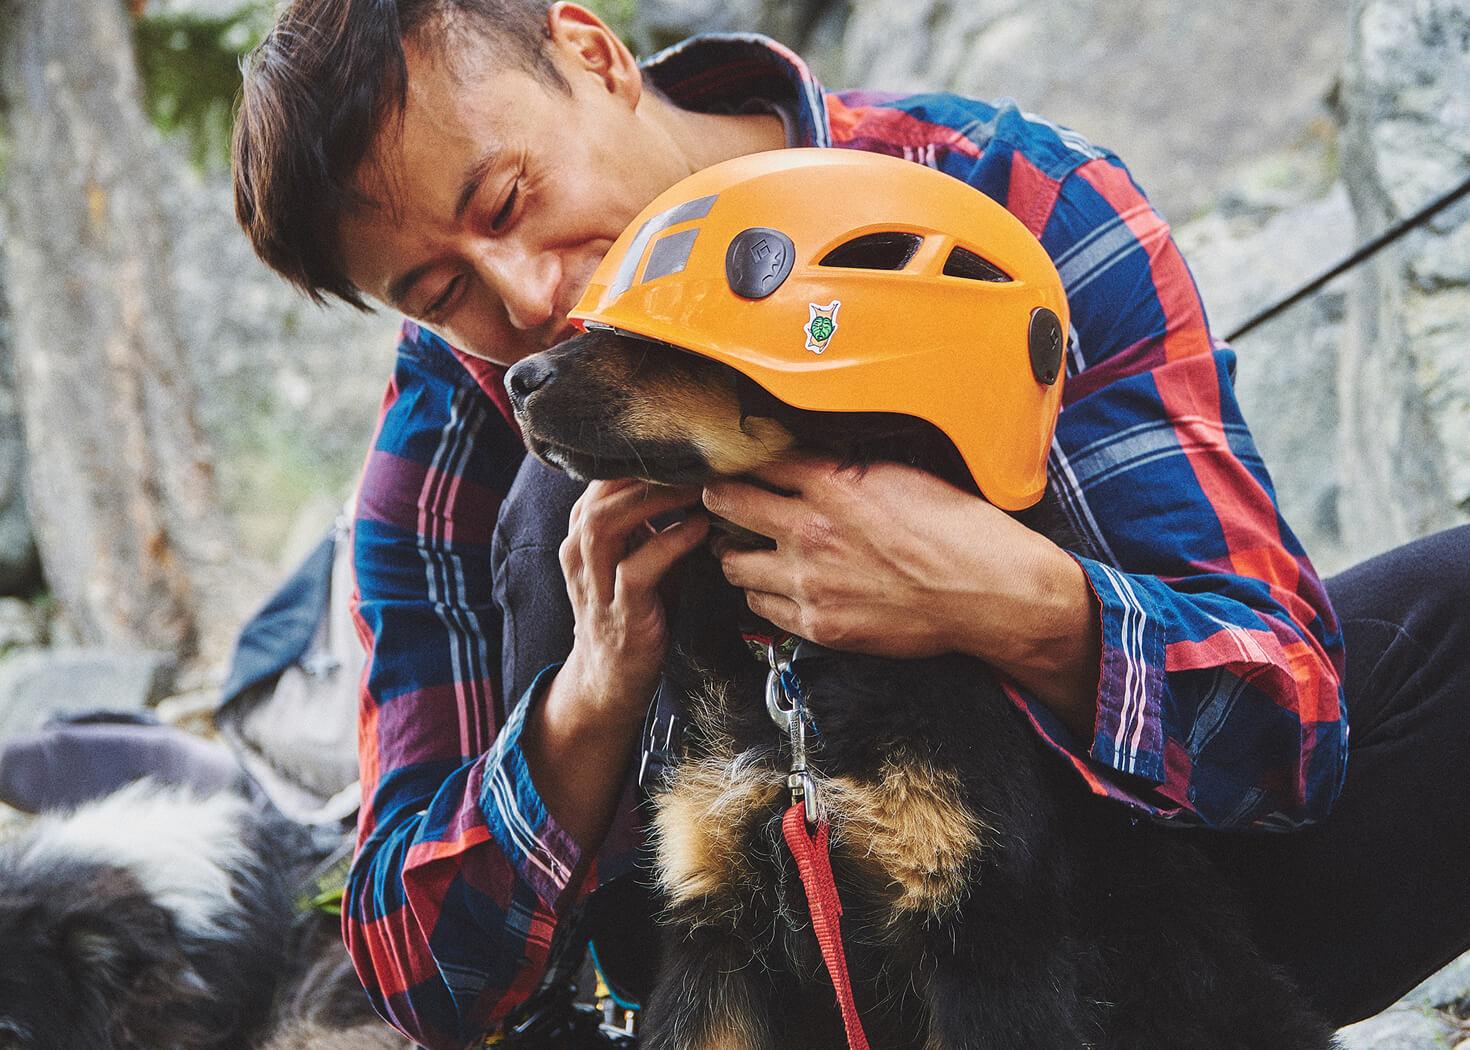 Man (Luca Li) in plaid shirt tying orange black diamond climbing helmet on black dog